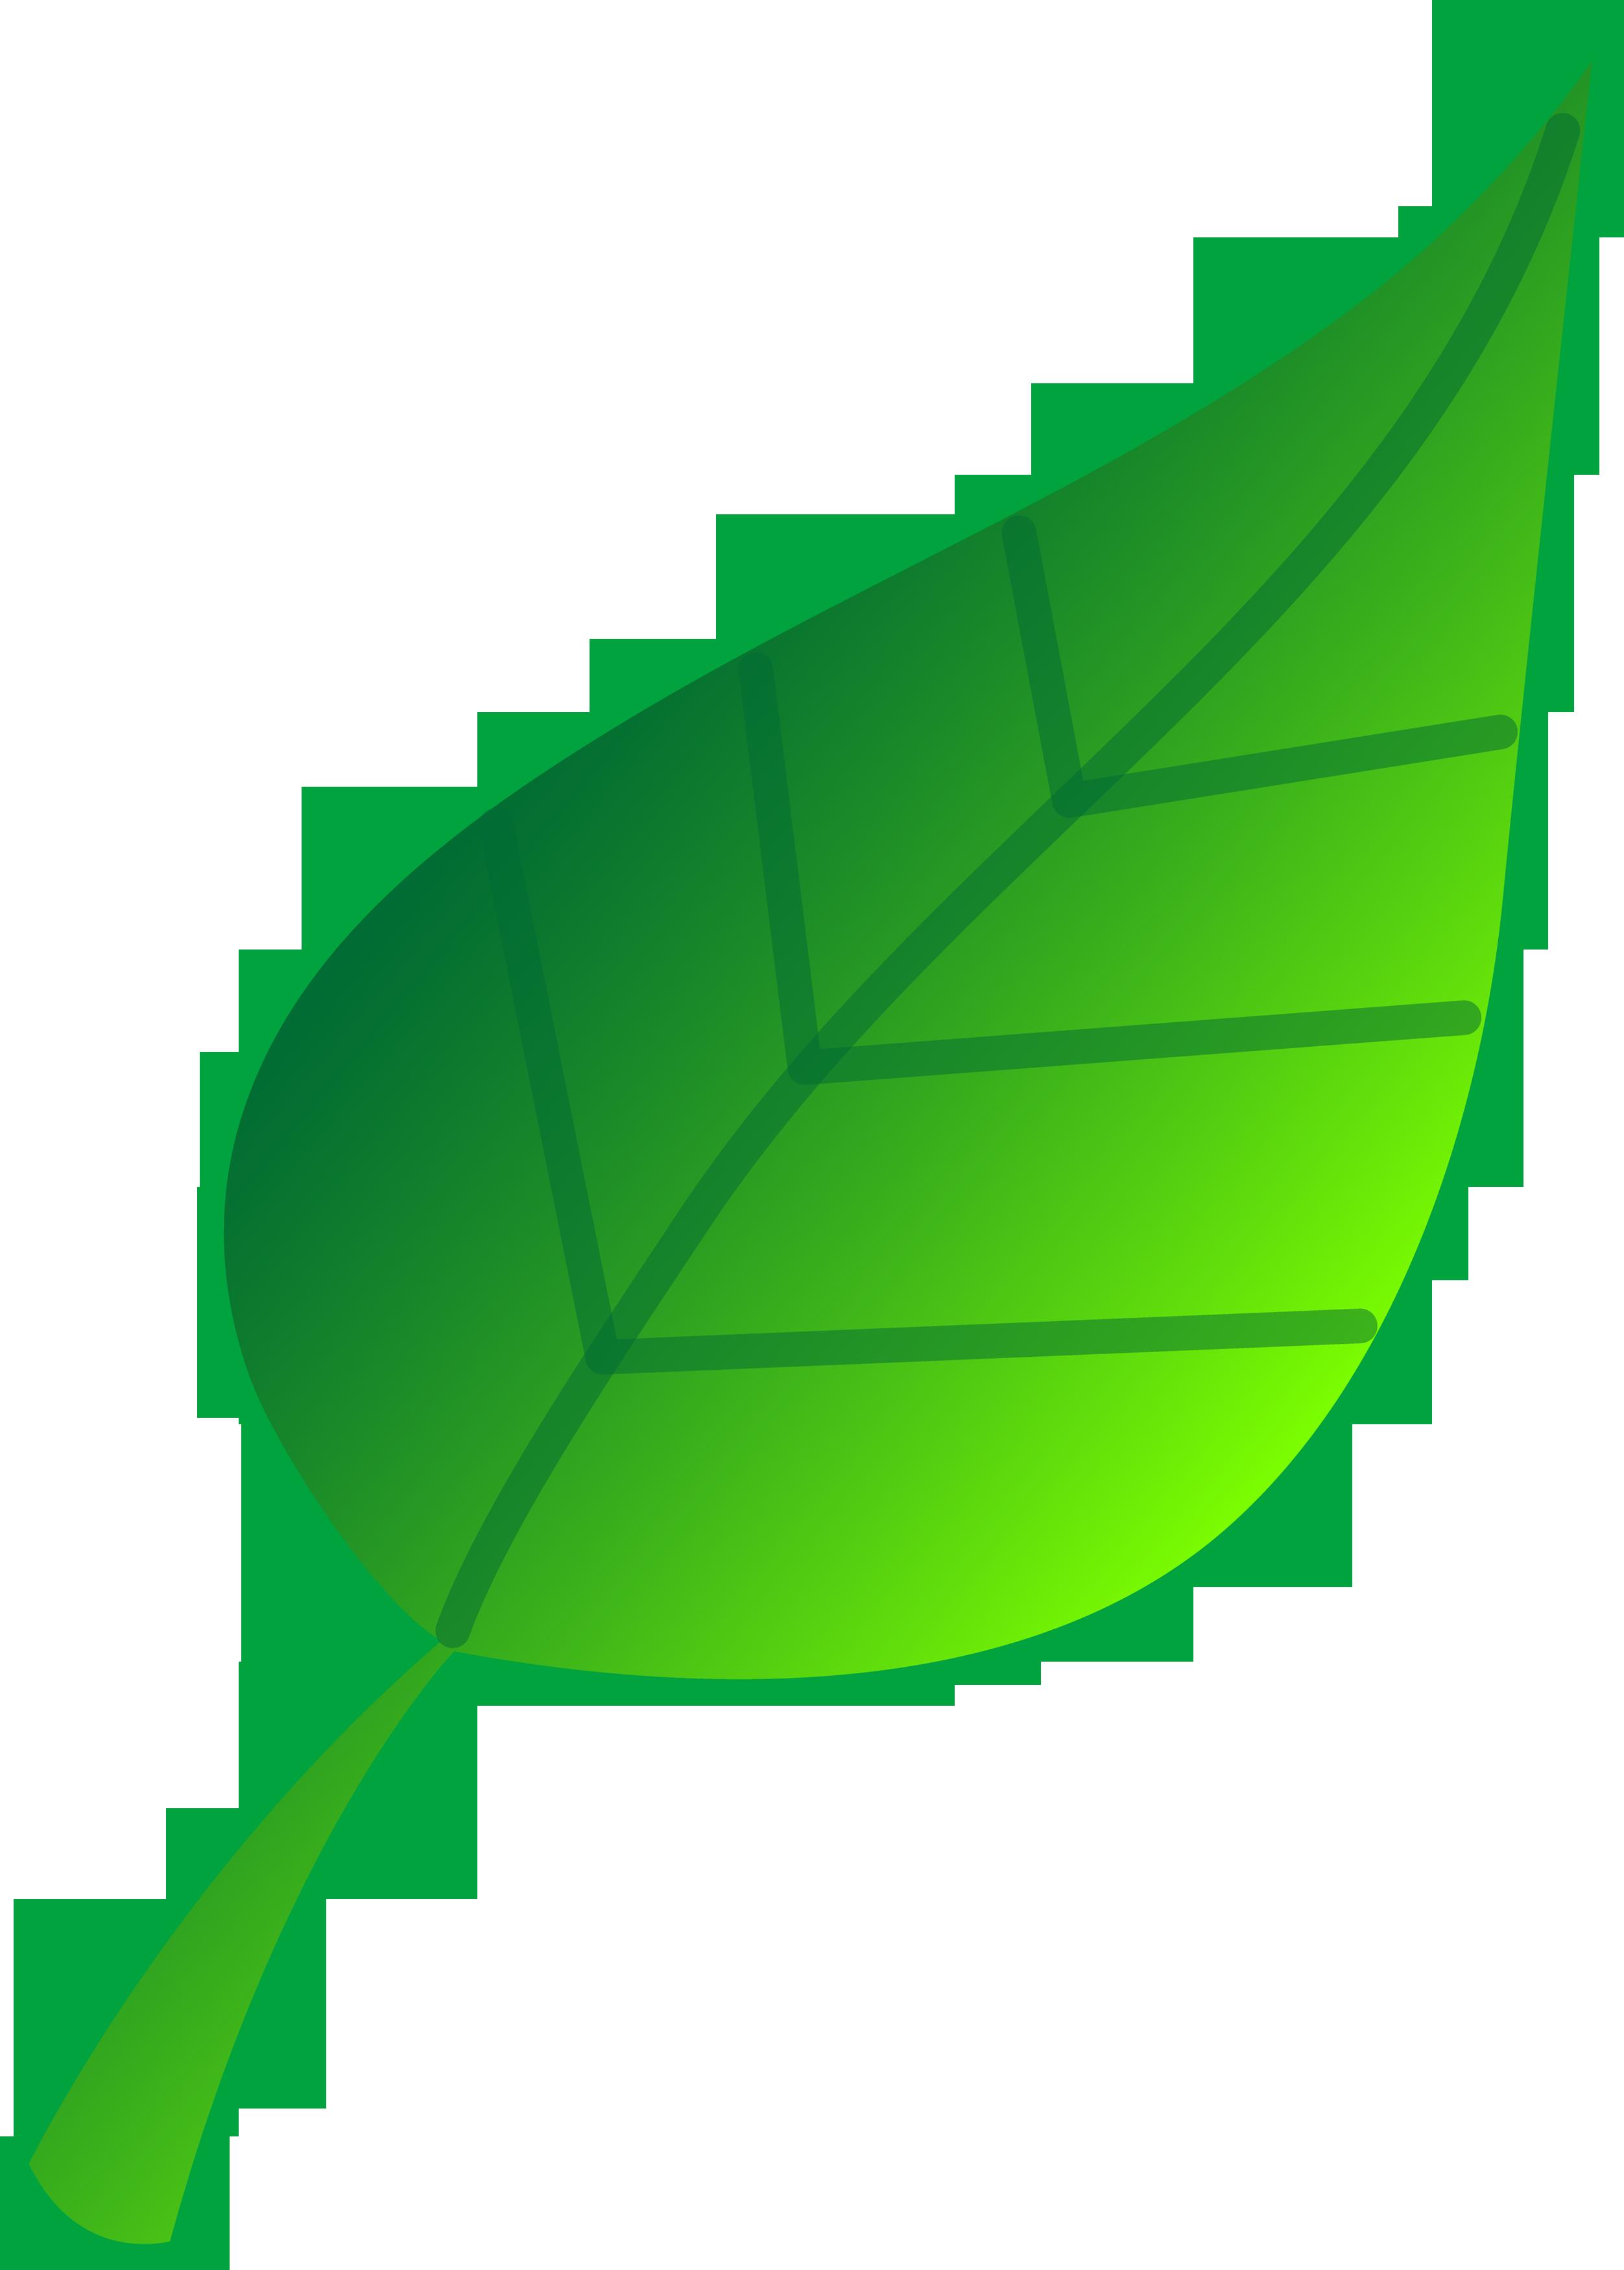 Leaf clip art images free clipart images